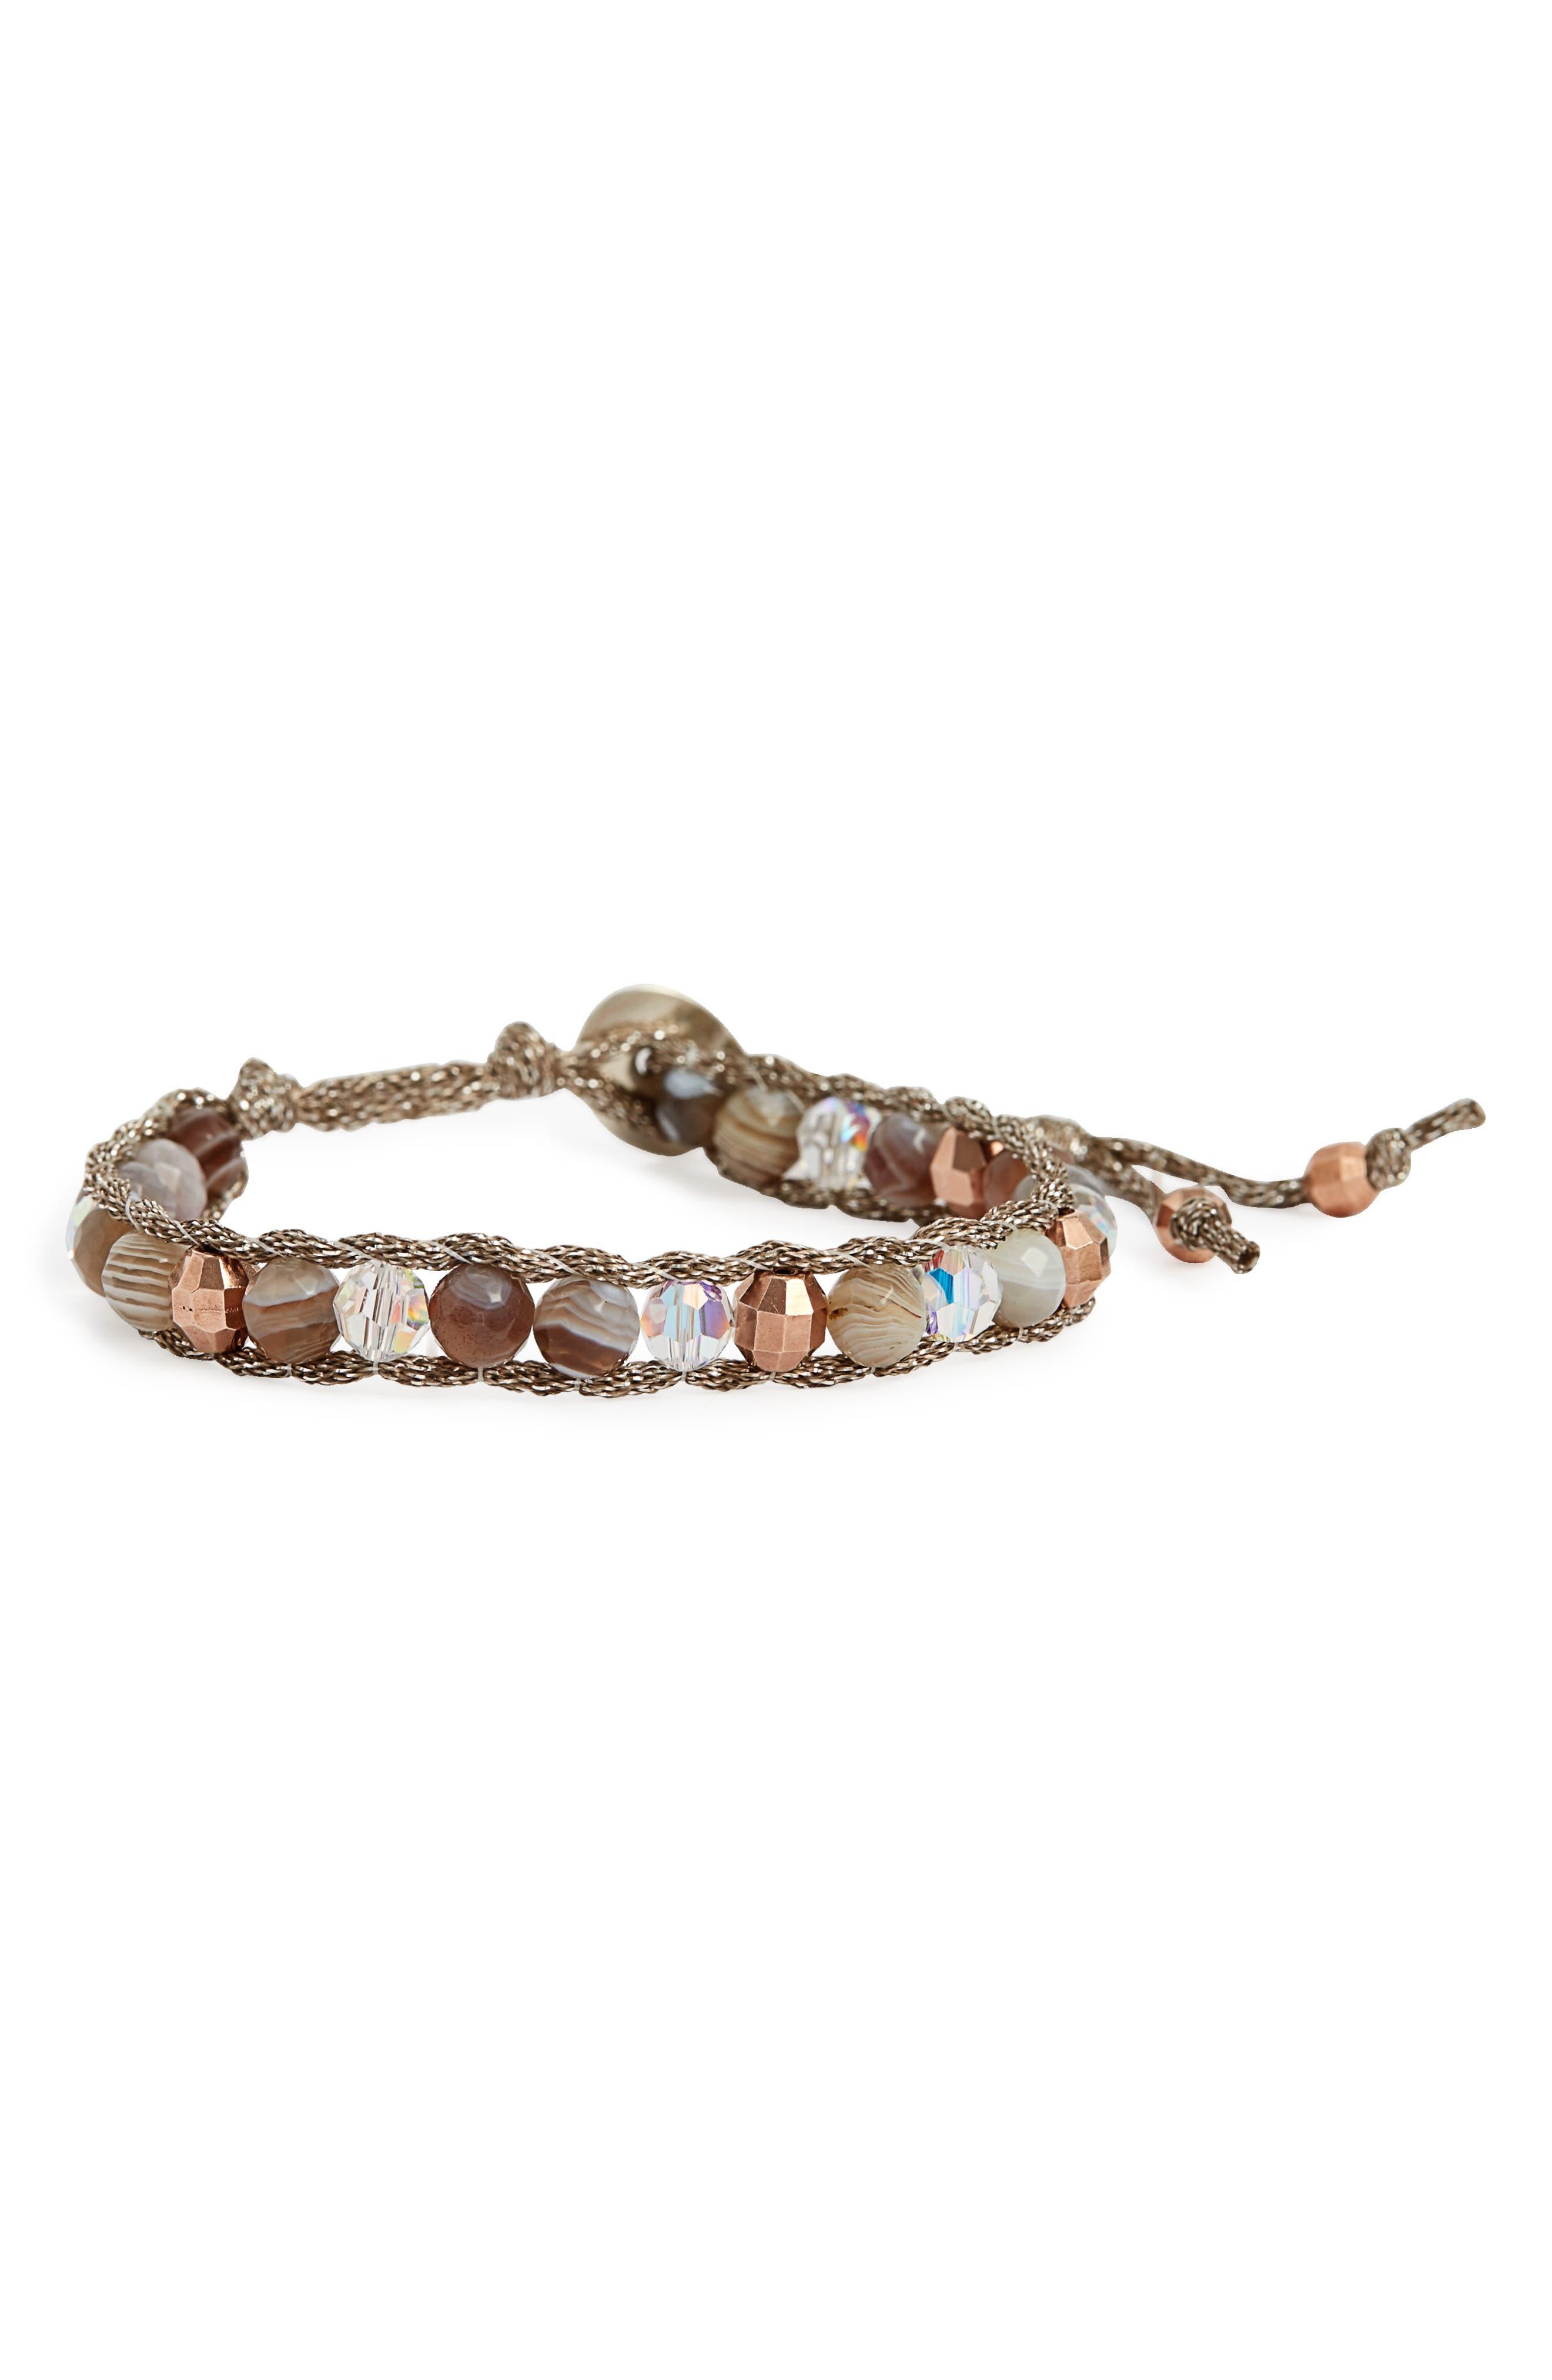 Main Image - Chan Luu Agate & Crystal Bracelet